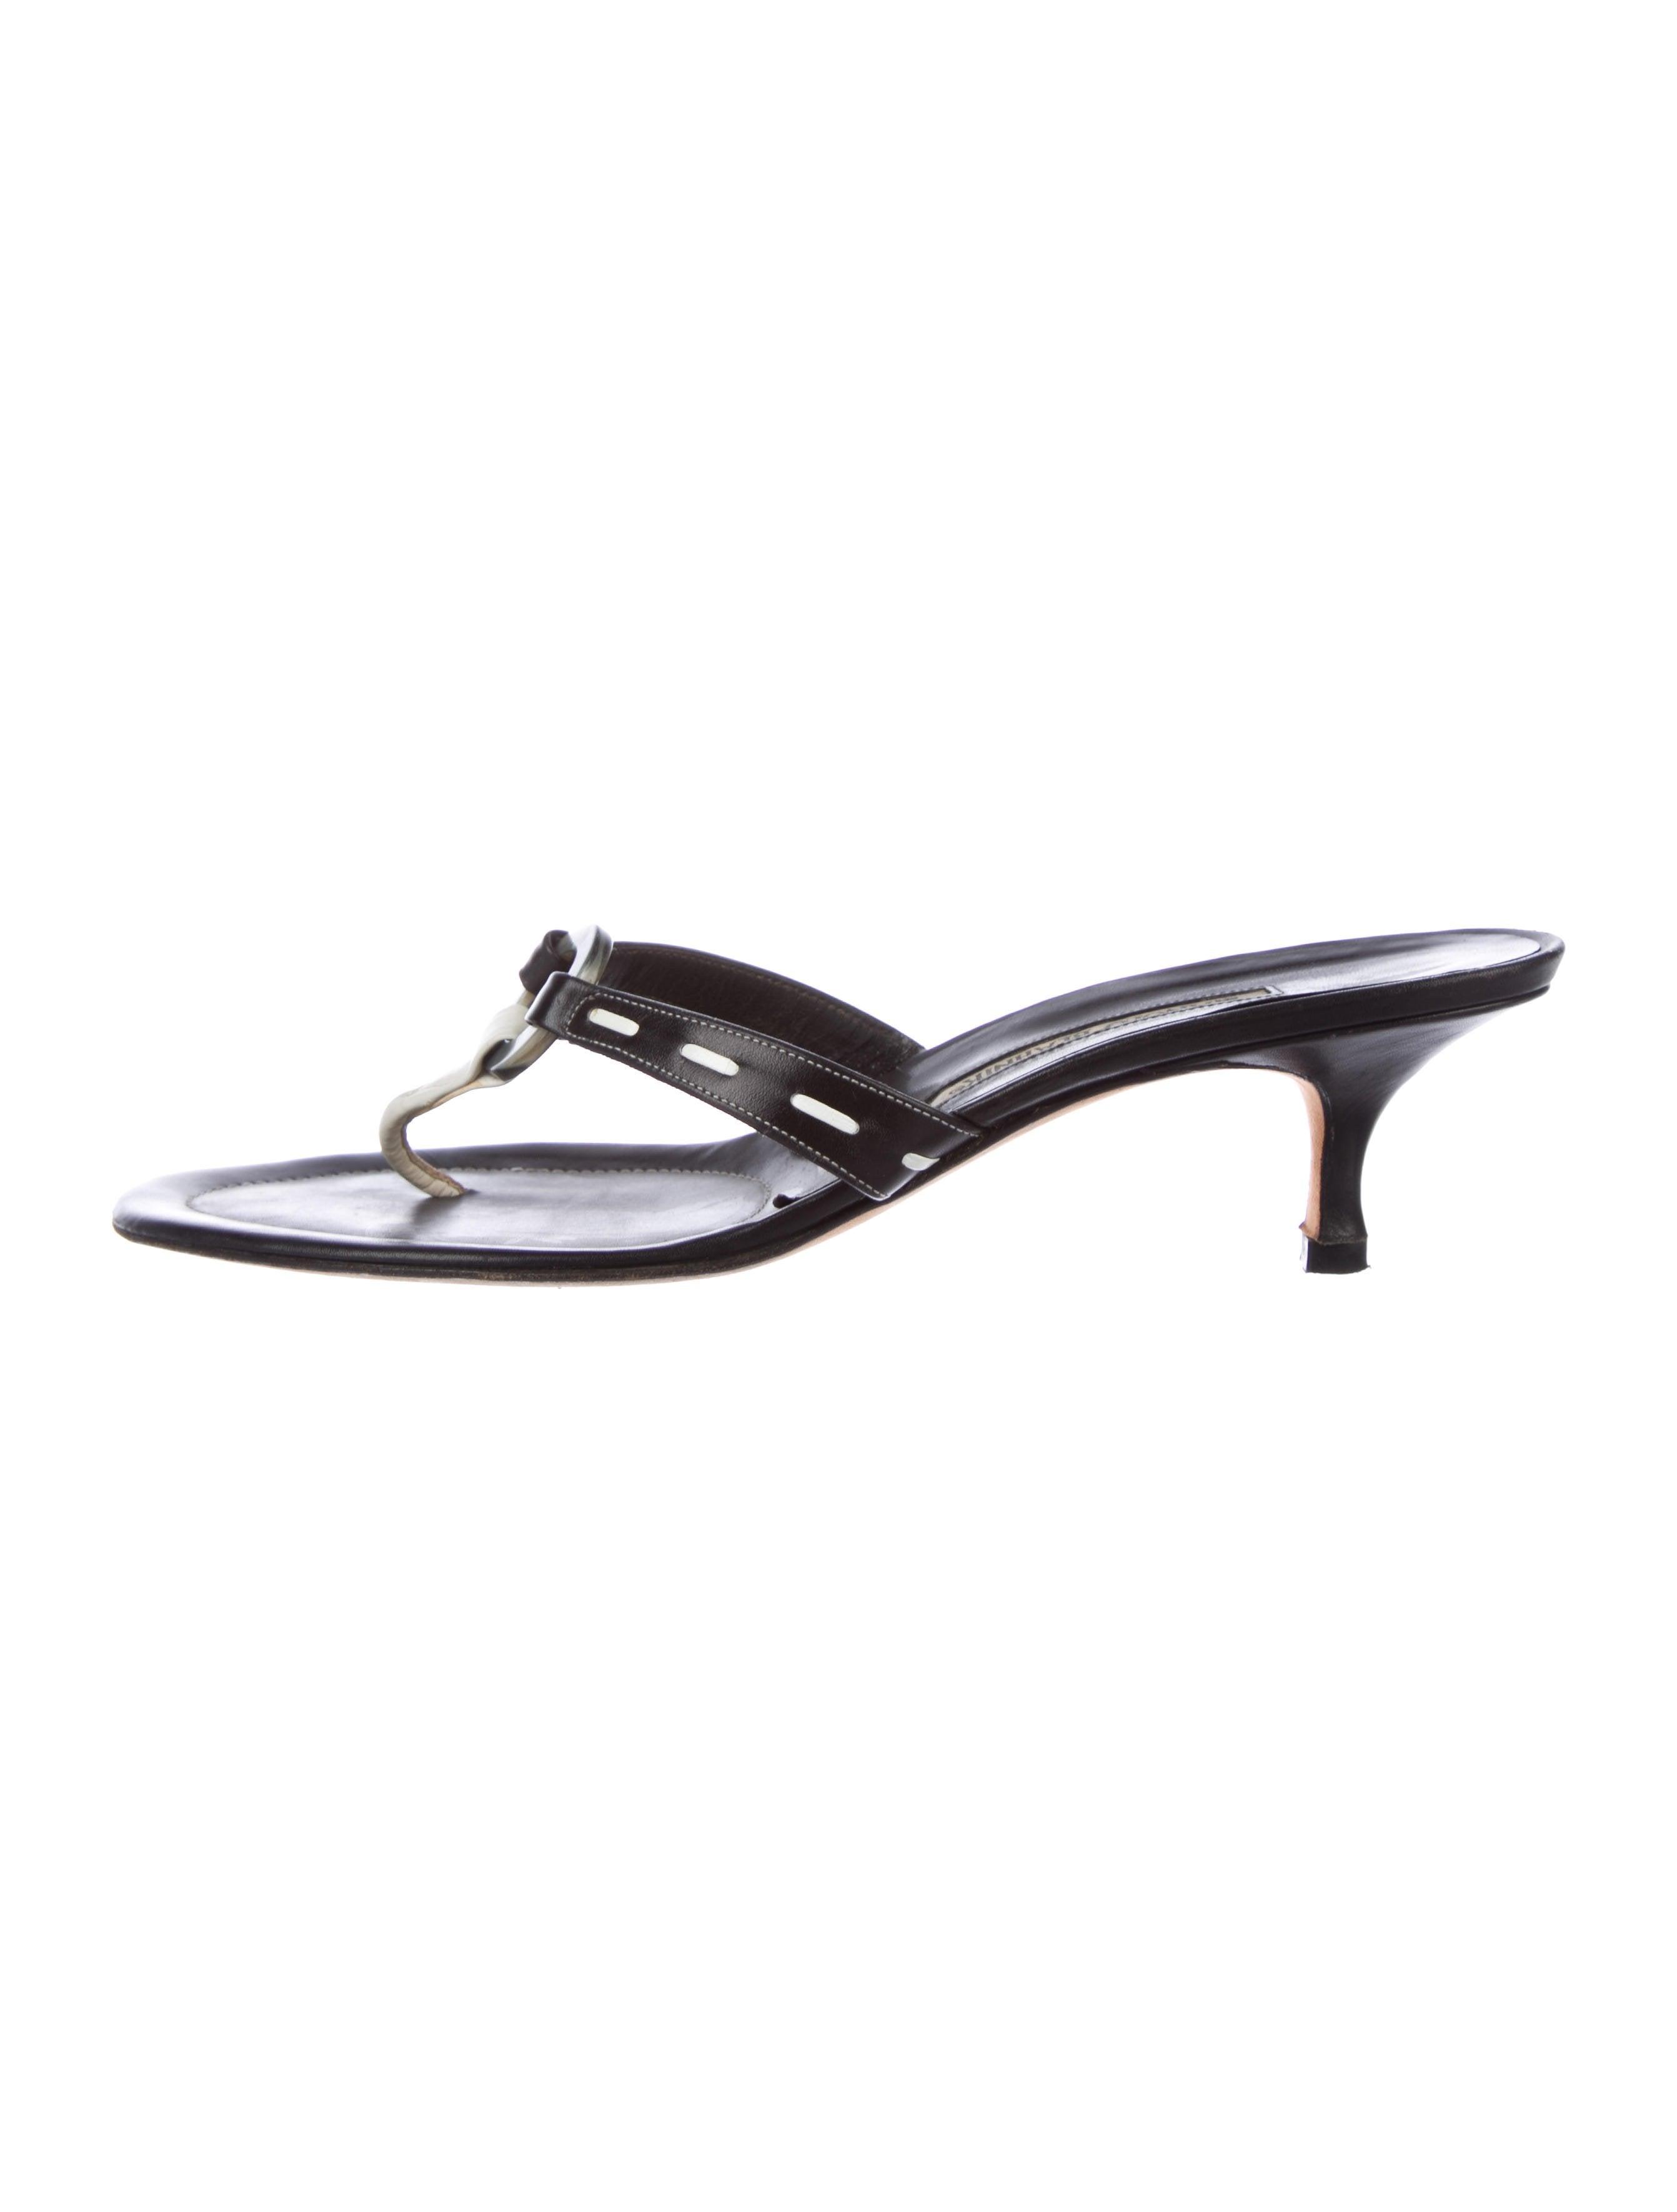 65541fa3356f9 ... Manolo Blahnik Embellished Leather Sandals. Embellished Leather Sandals